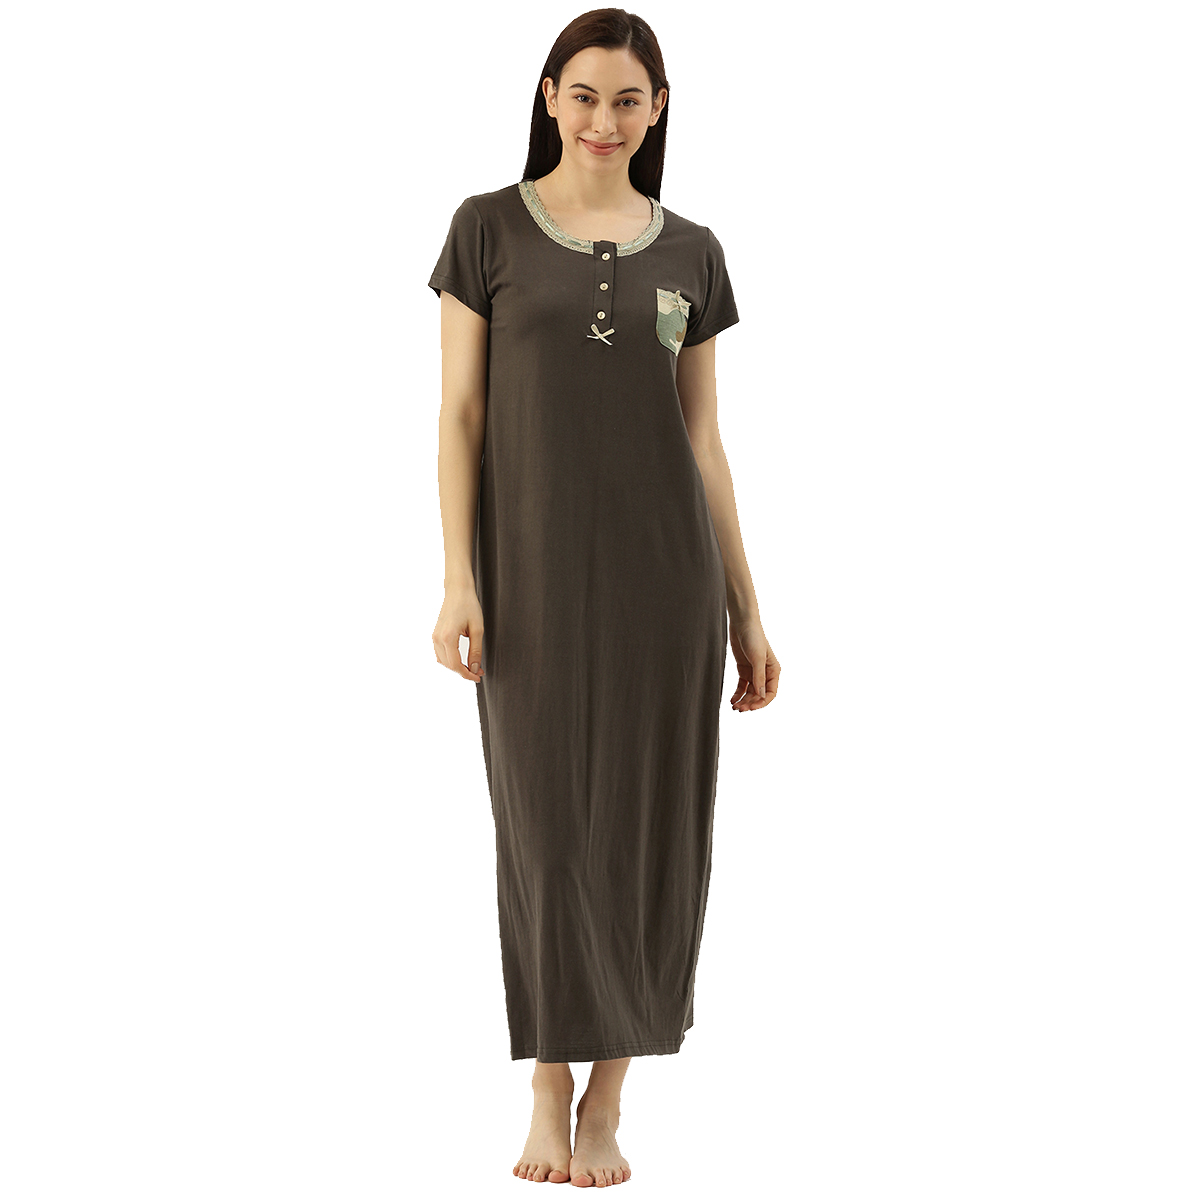 Slumber Jill Kaki Camo Pocket Night Dress